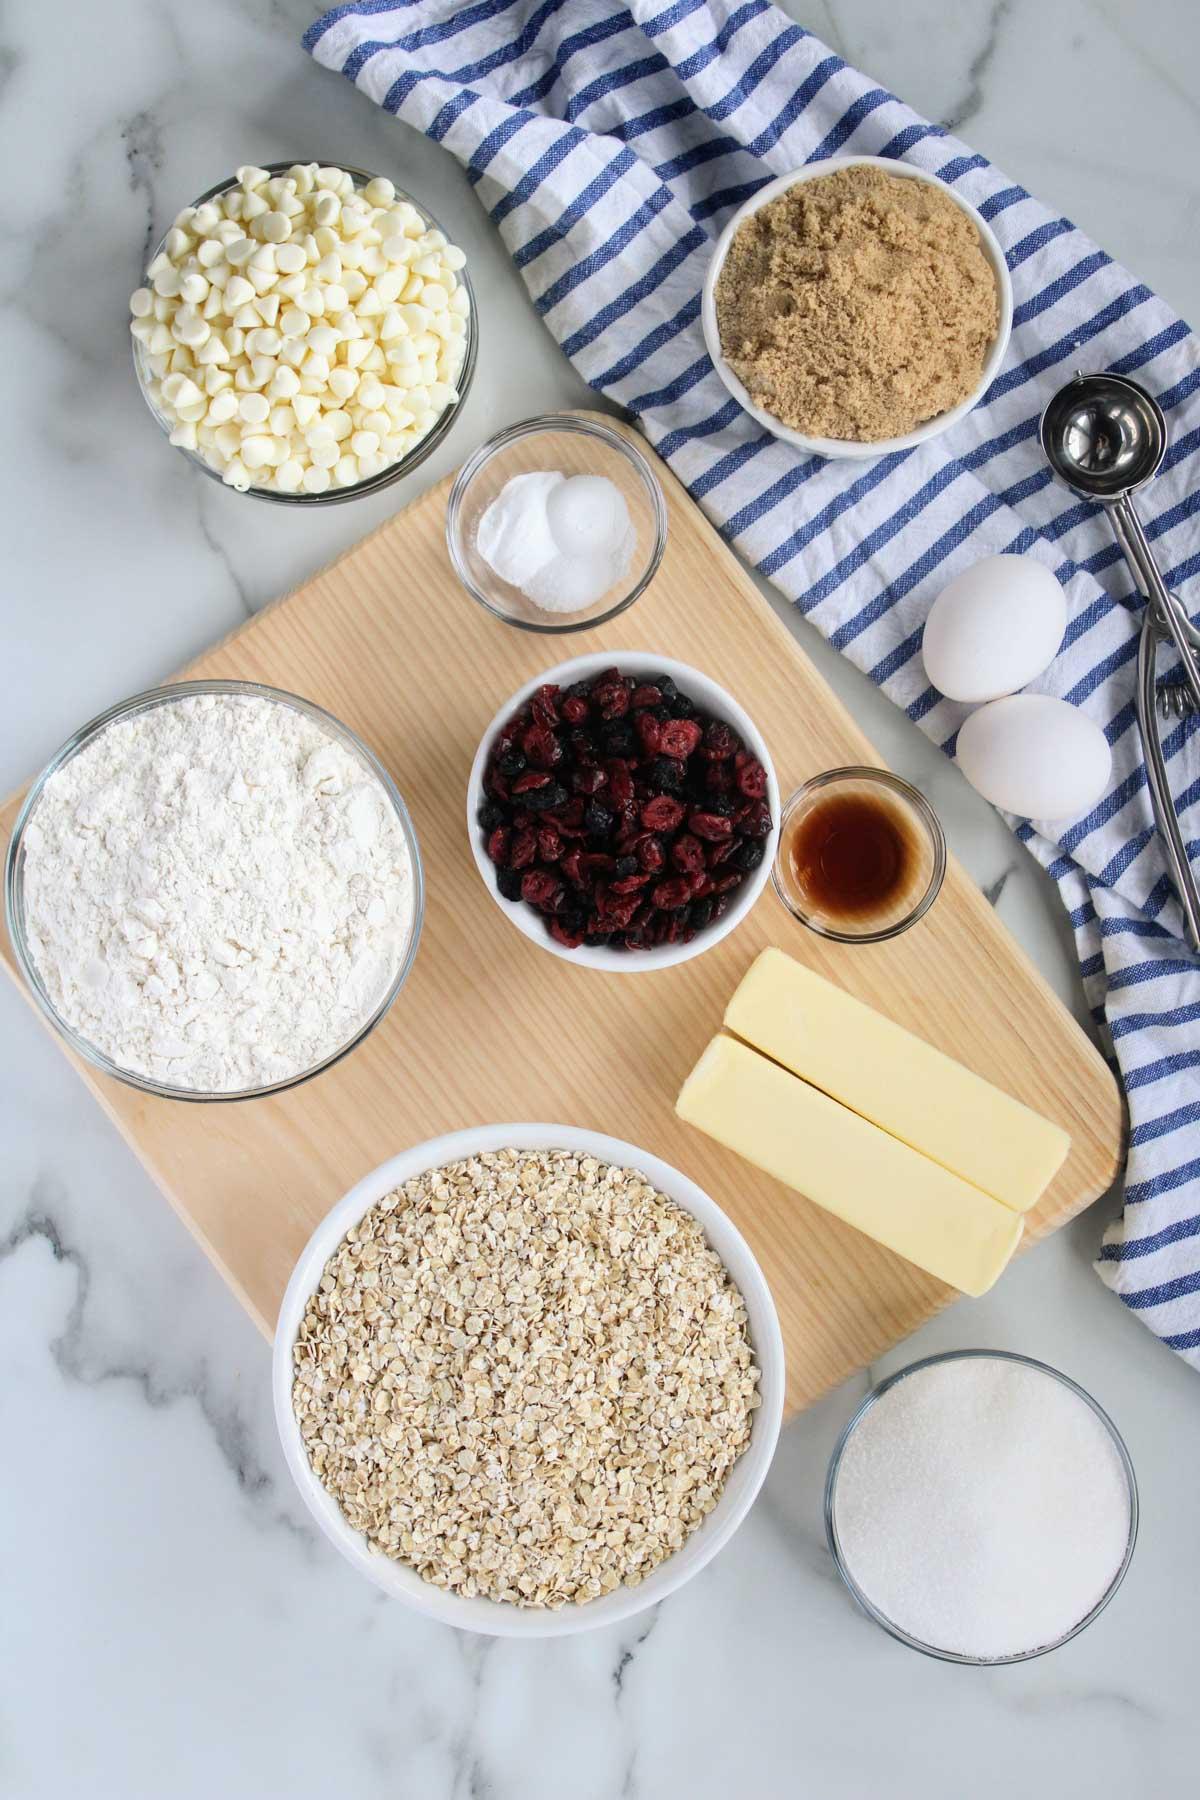 ingredients for oatmeal cookies